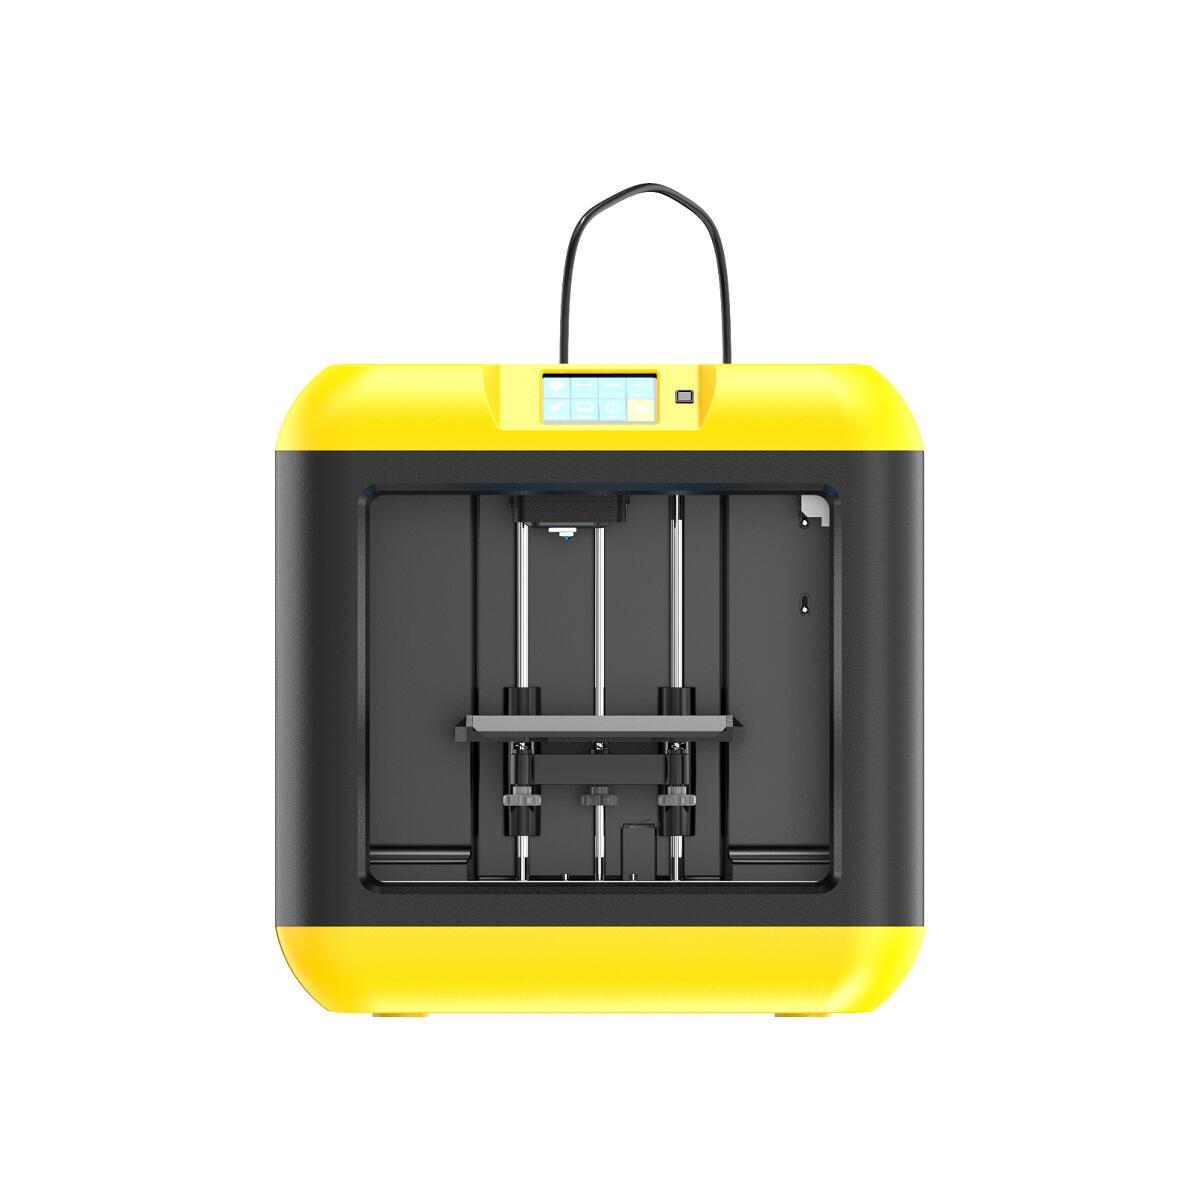 Flashforge デスクトップ 家庭用3D プリンター Finder Lite (イエロー) 送料無料